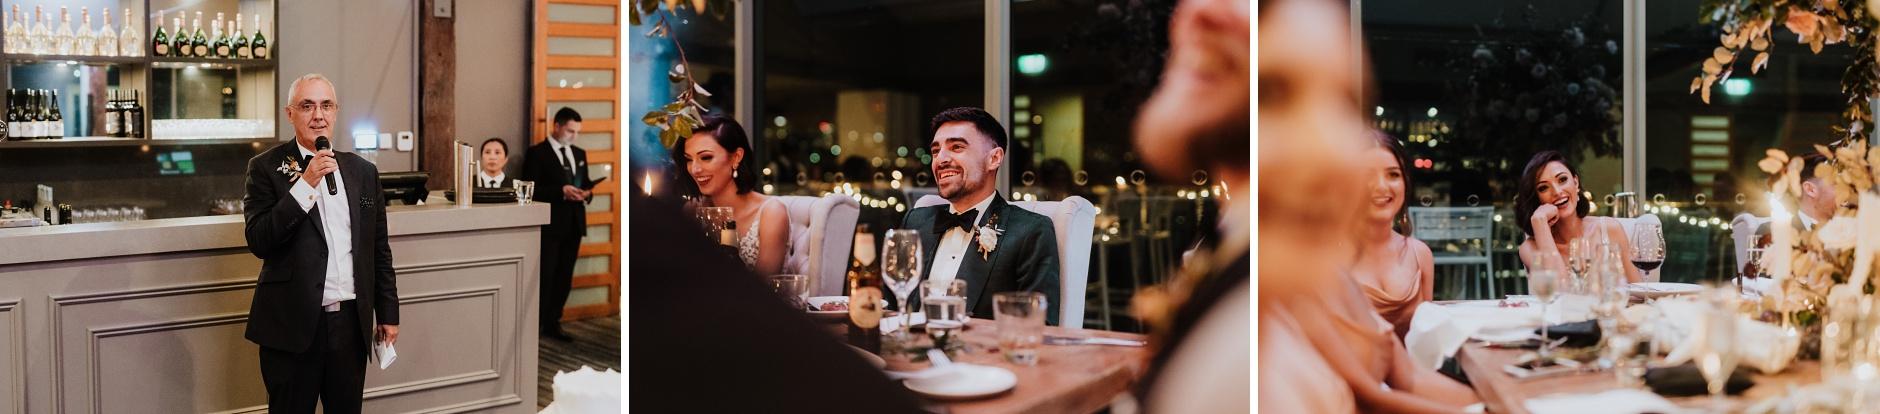 Sydney-Wedding-Photographer_0162.jpg